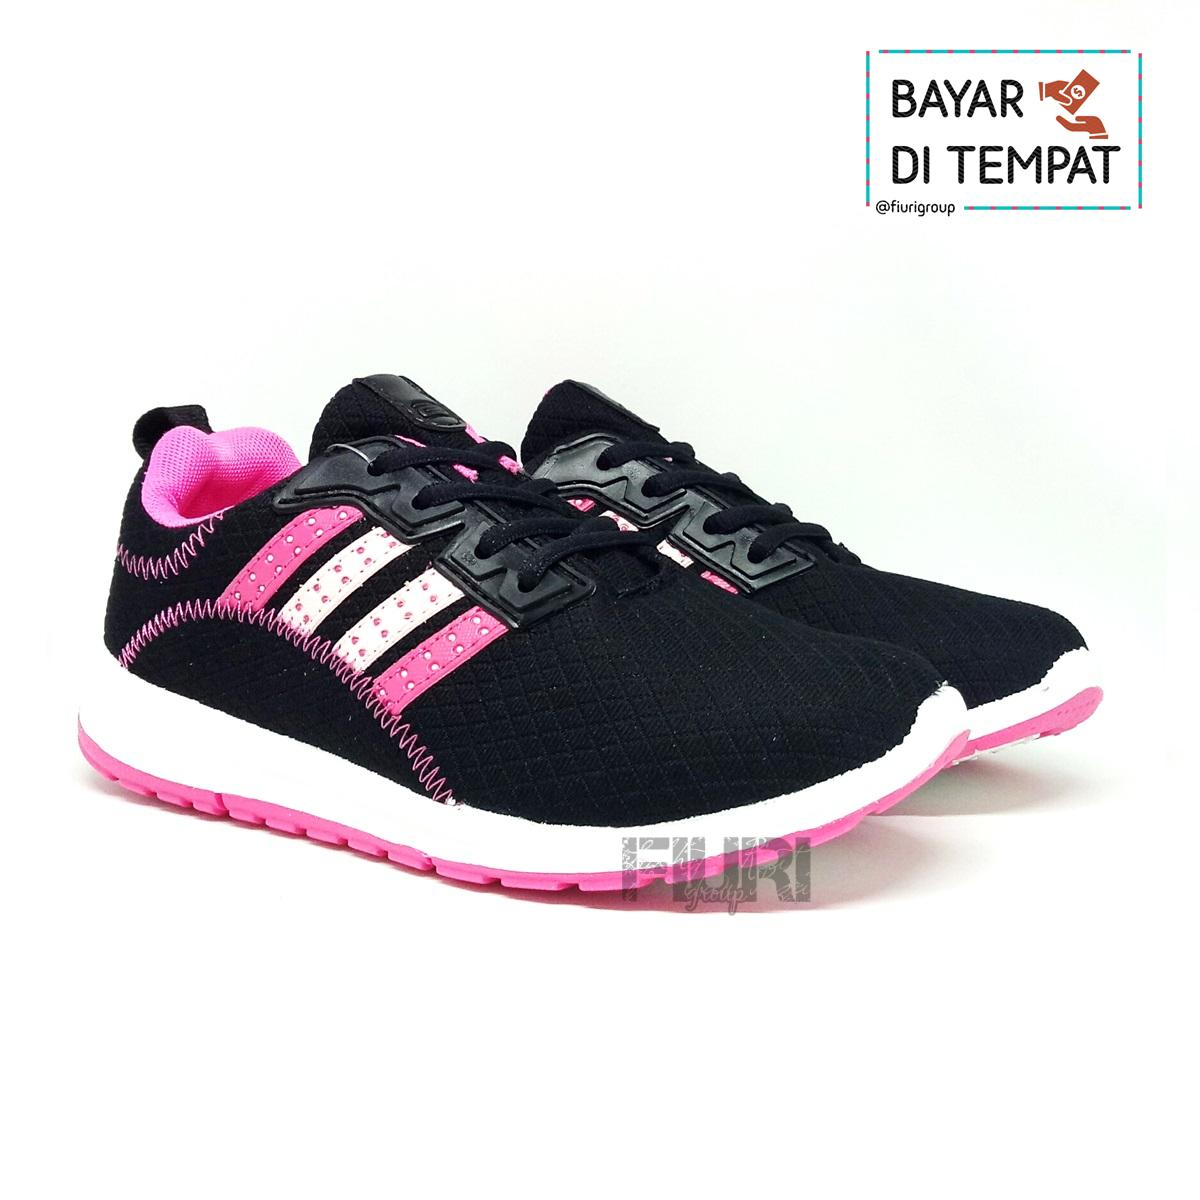 FIURI - Ando Original - Plano Black Pink - Sepatu Olahraga Sneakers Sport -  Sepatu Ando 598927ff2c